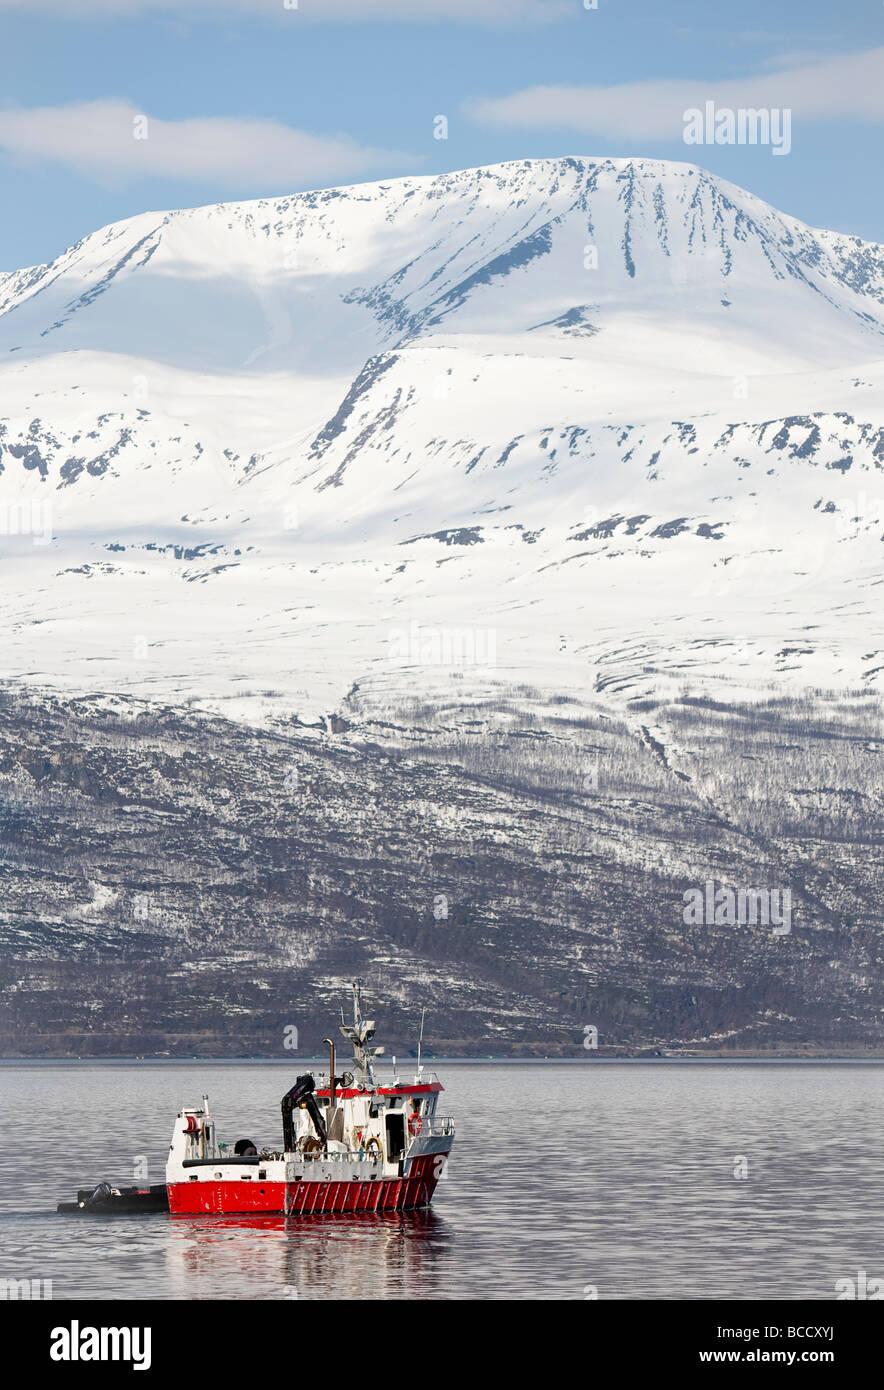 Norwegian red fishing trawler and cargo vessel at Storfjord Skibotn Norway - Stock Image